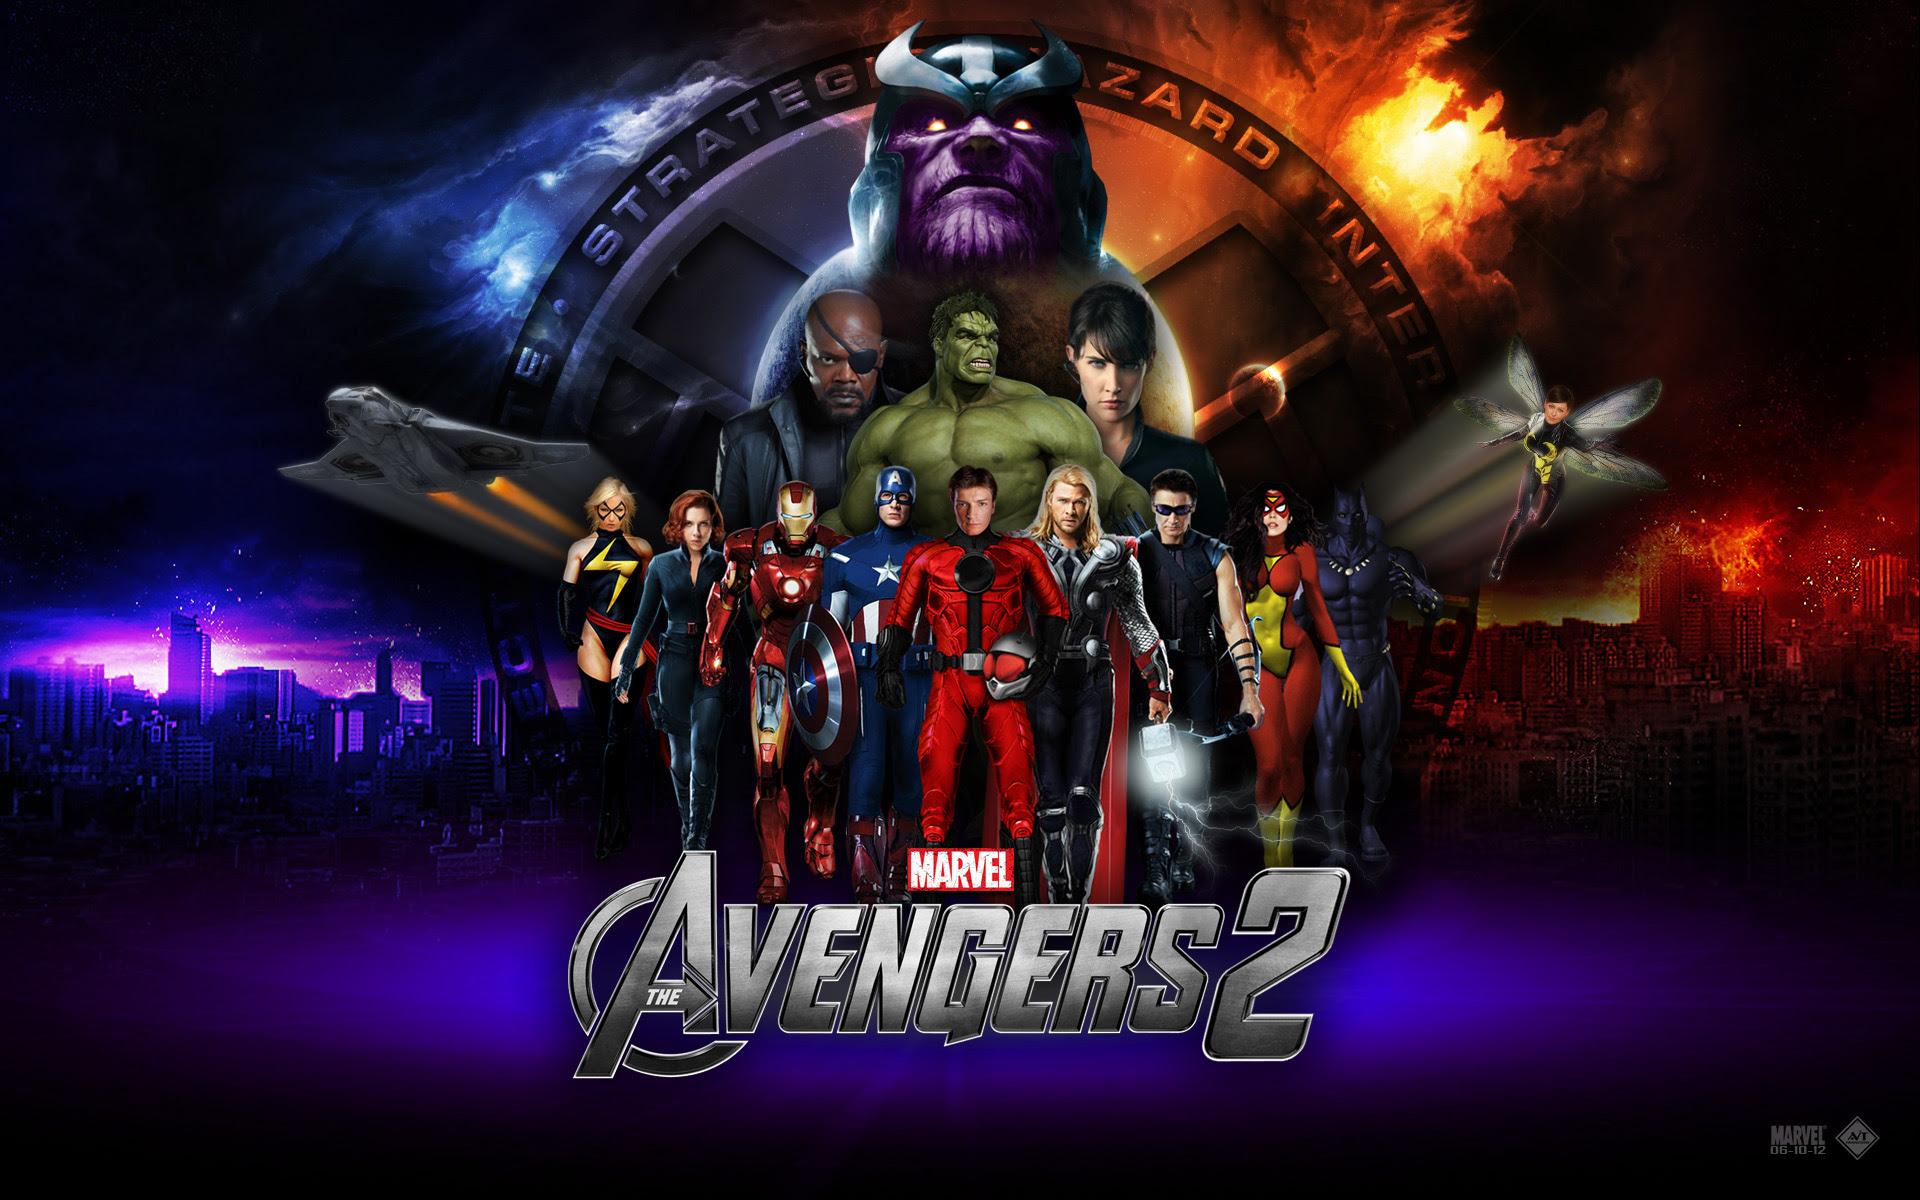 Avengers Age Of Ultron Wallpaper 1